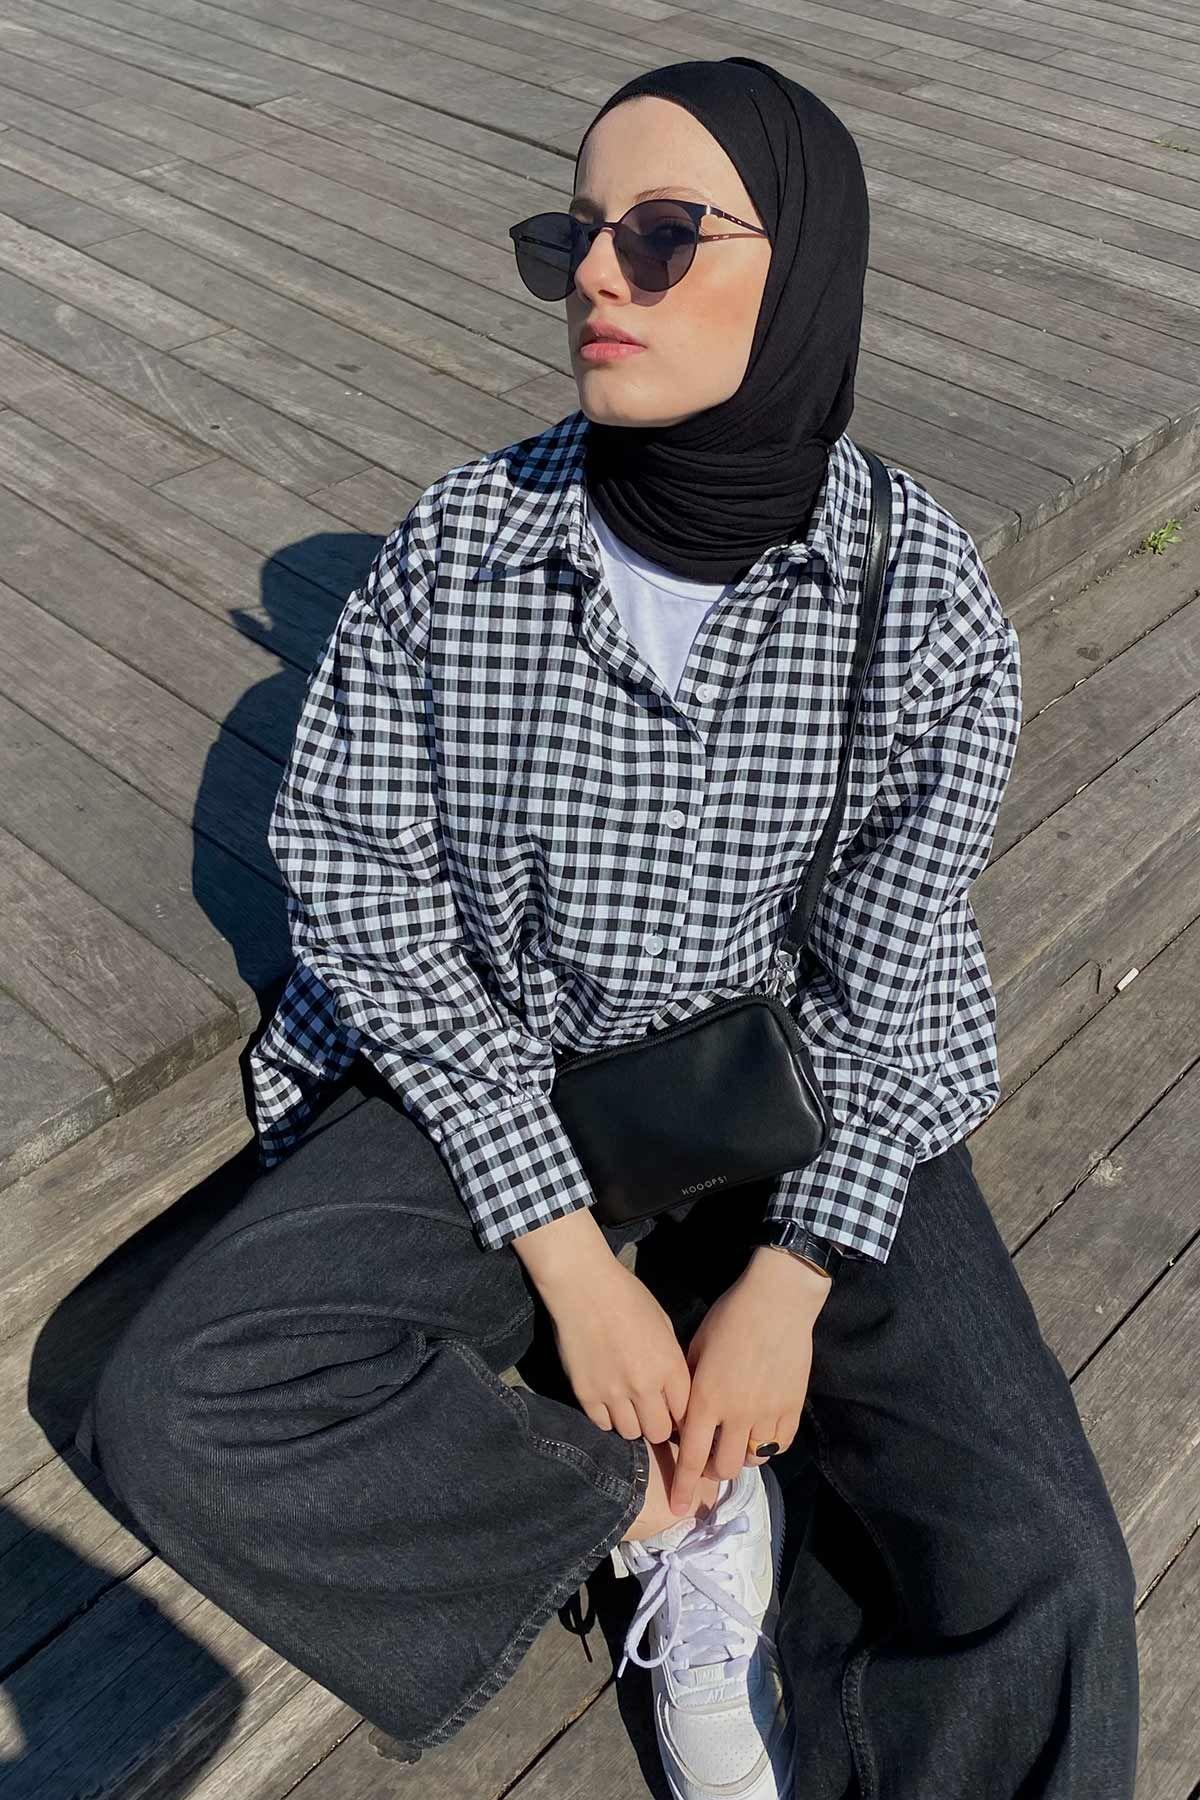 Elif'in Puffy Gömlek Kombini